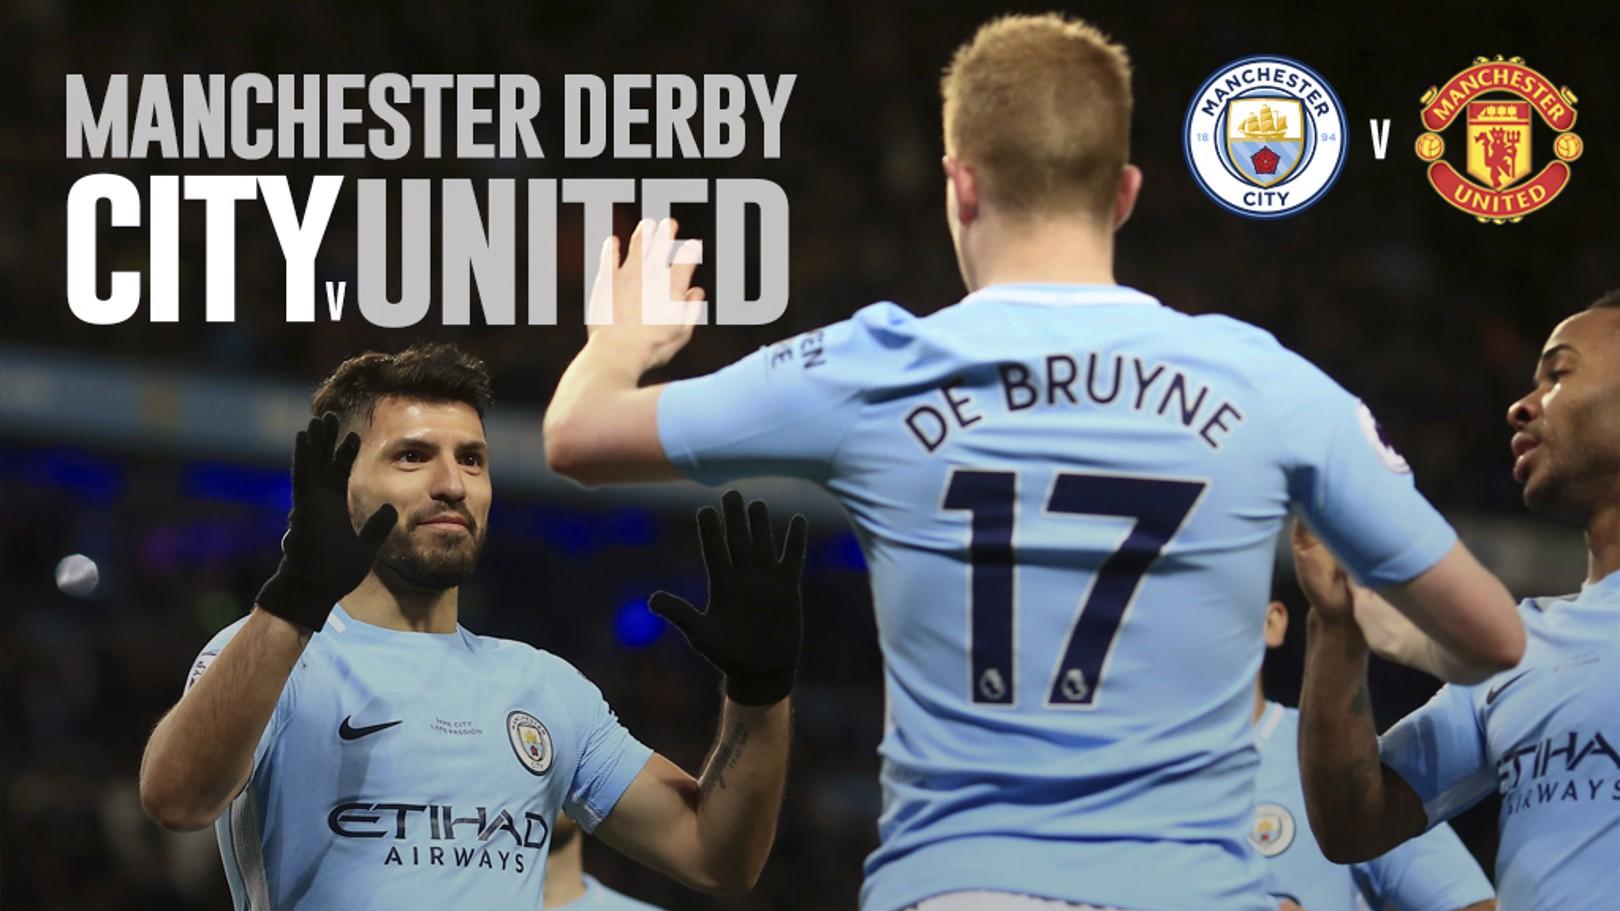 City v United: LIVE!